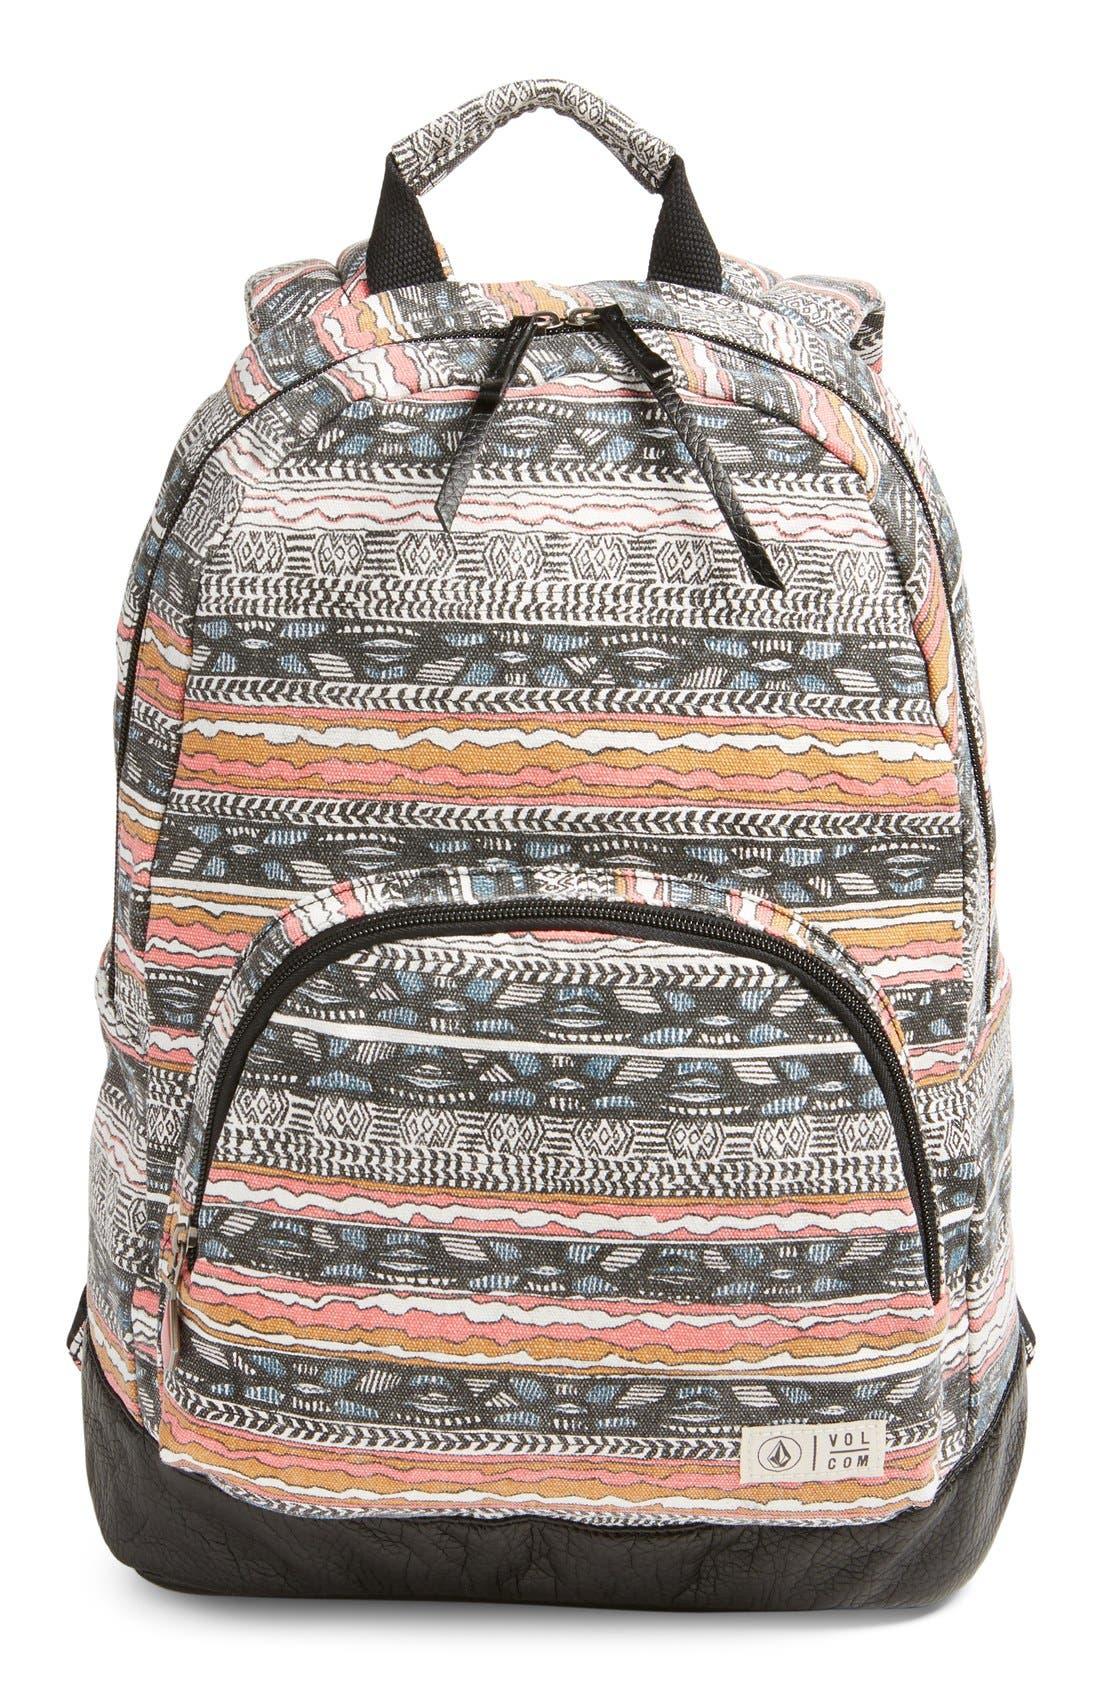 Alternate Image 1 Selected - Volcom 'Schoolyard' Canvas Backpack